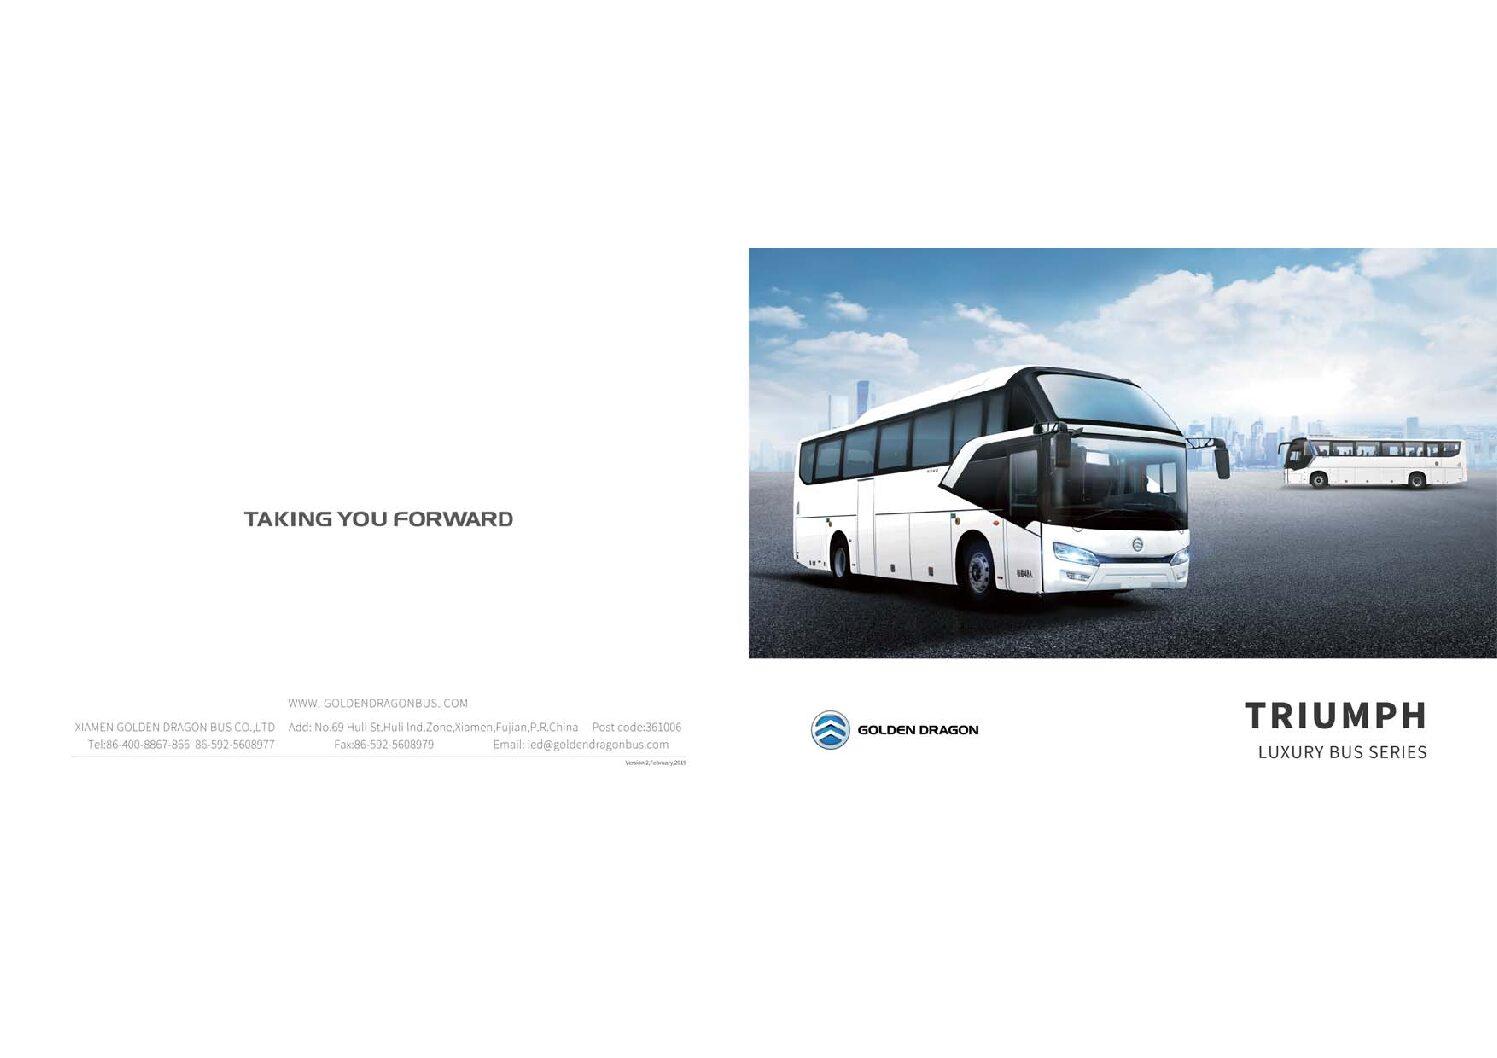 Golden Dragon – Triumph Luxury Bus Series